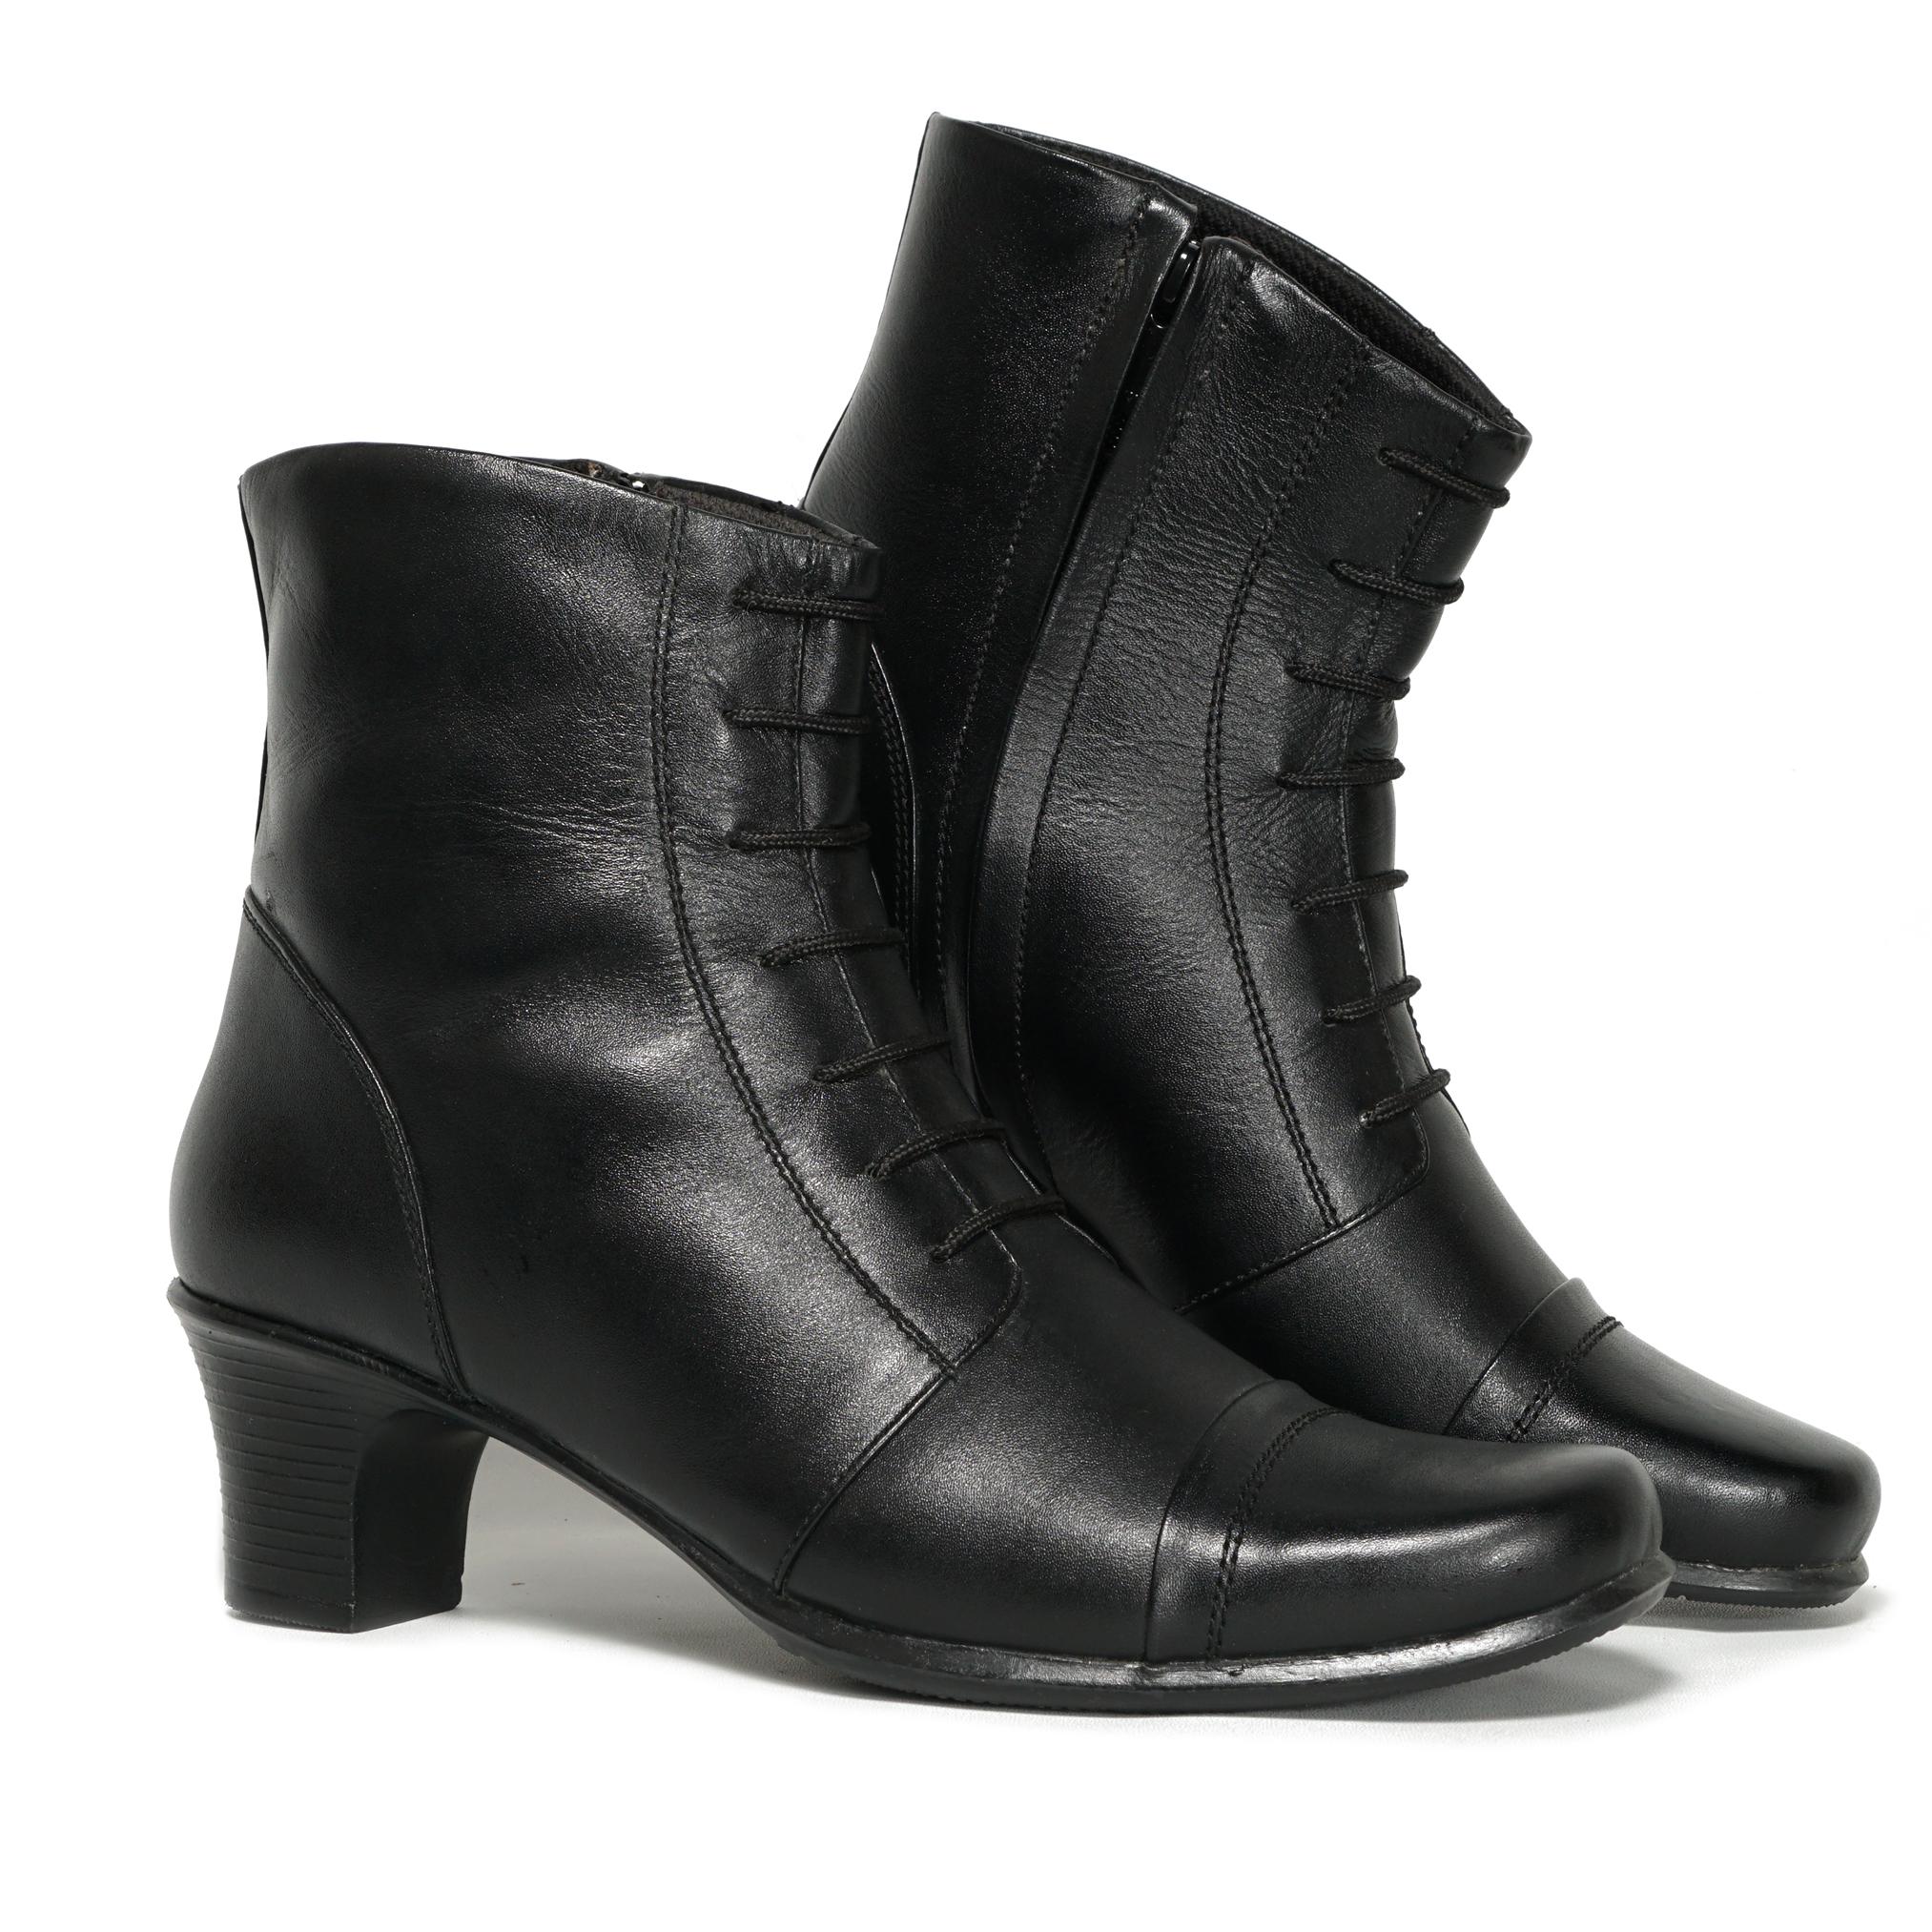 sepatu wanita boots kulit formal vidha meifa boots zipper hak 5cm bv2001